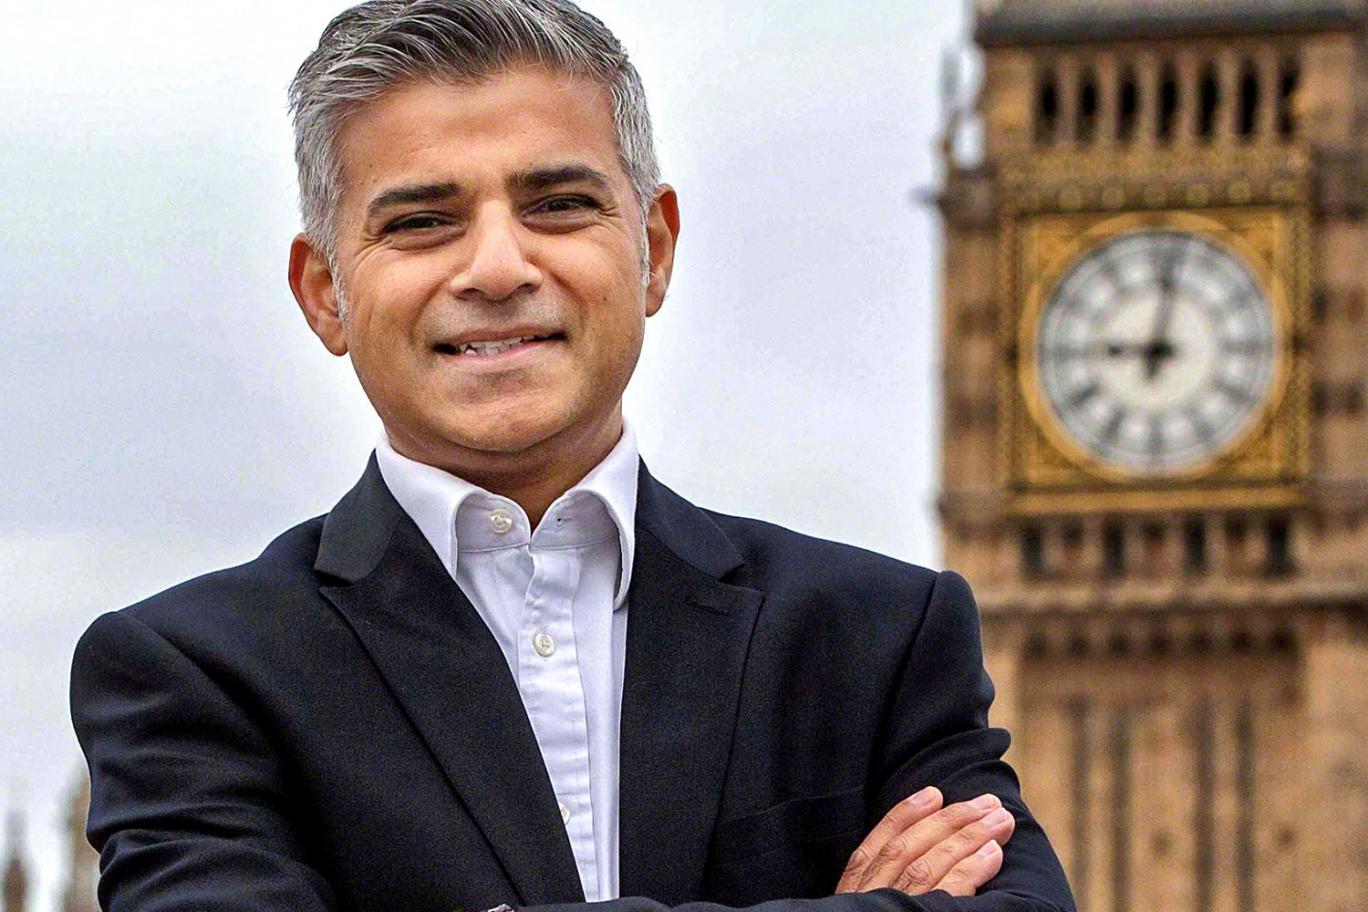 Khan Sadiq muslim mayor of london logical meme